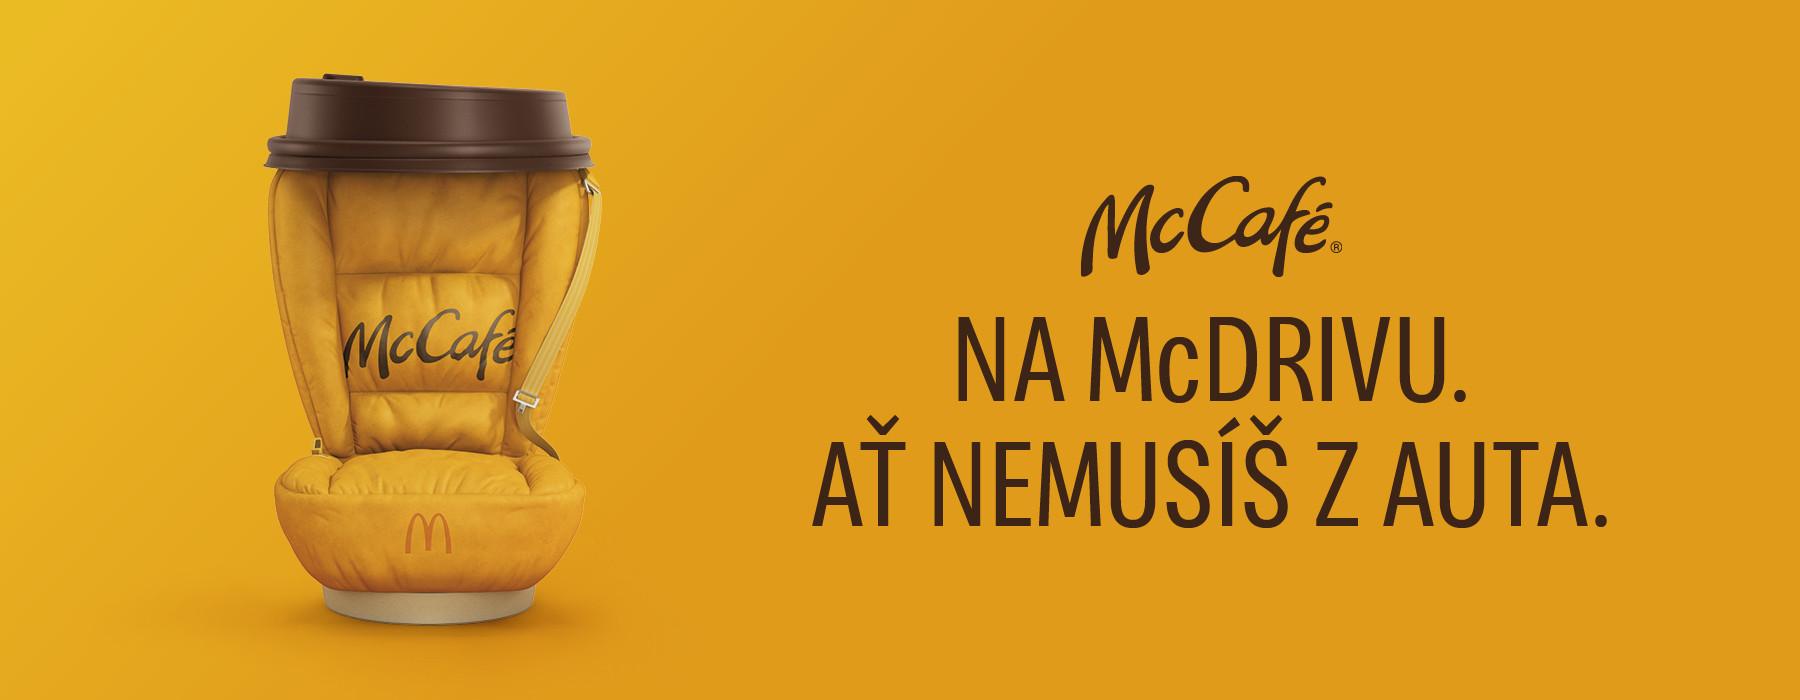 McCafé Anywhere & Anytime